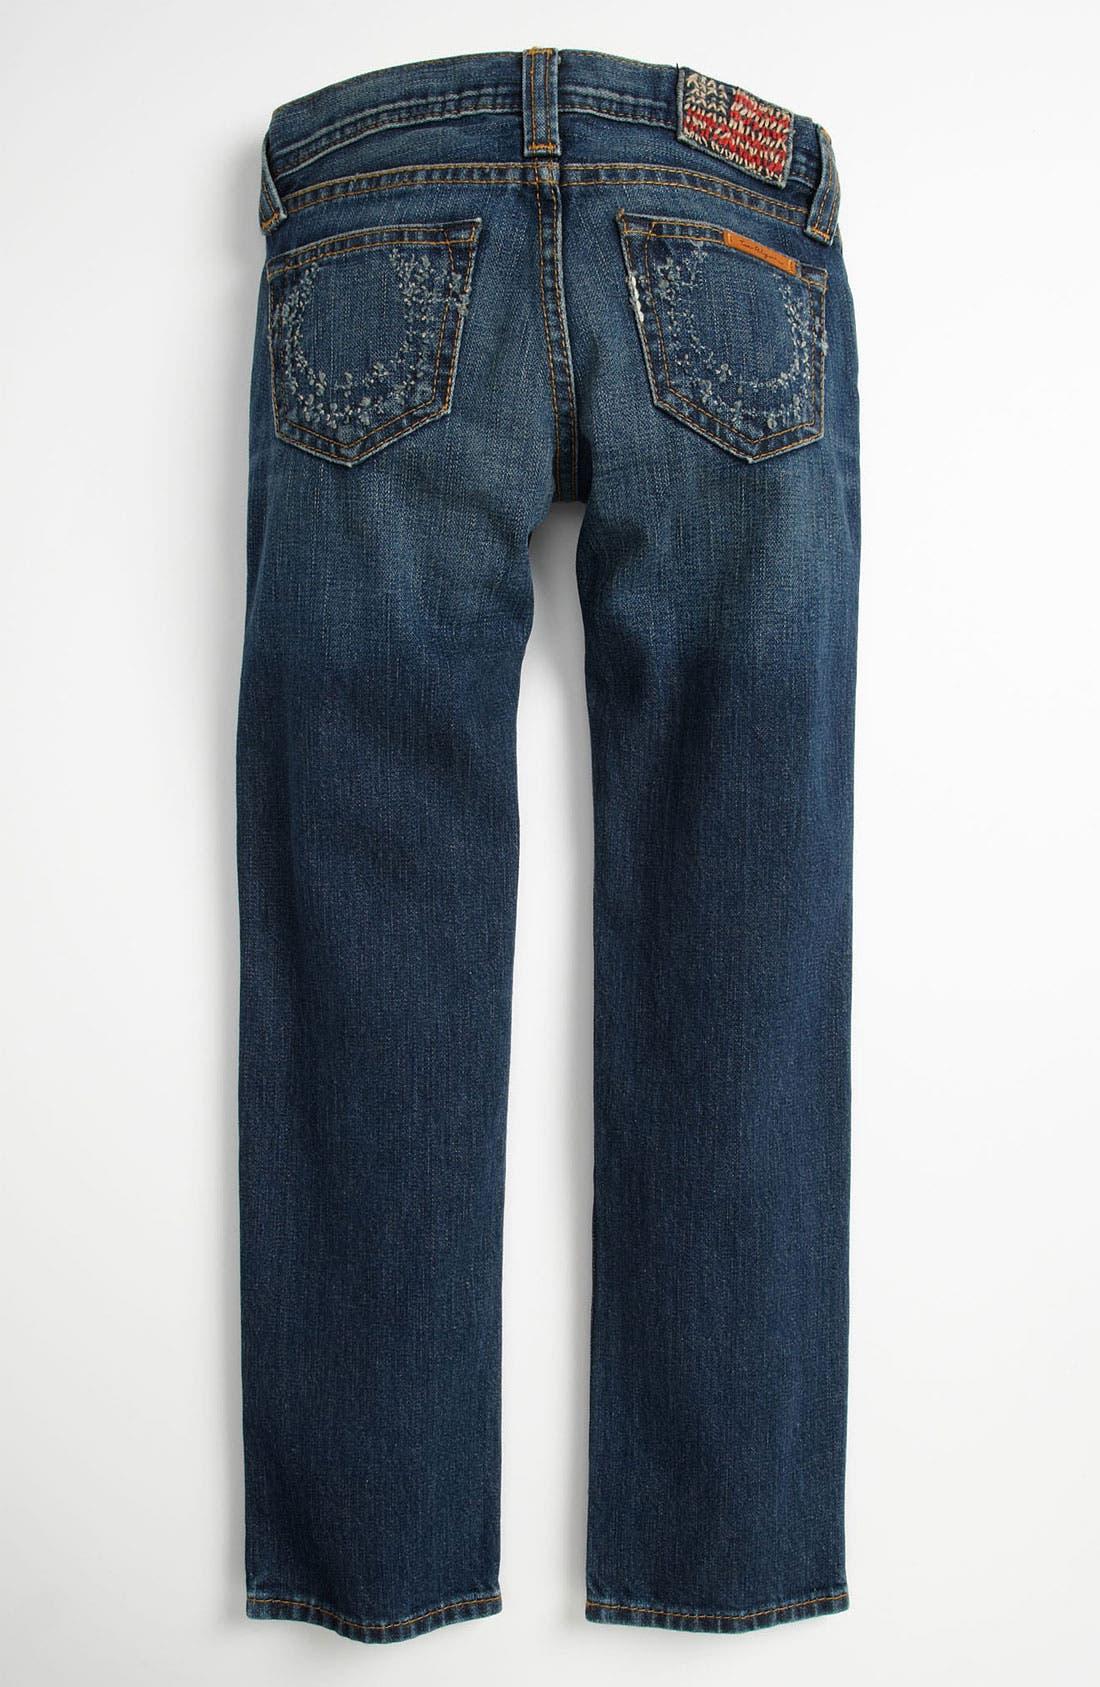 Alternate Image 1 Selected - True Religion Brand Jeans 'Rocco Phantom' Skinny Jeans (Big Boys)